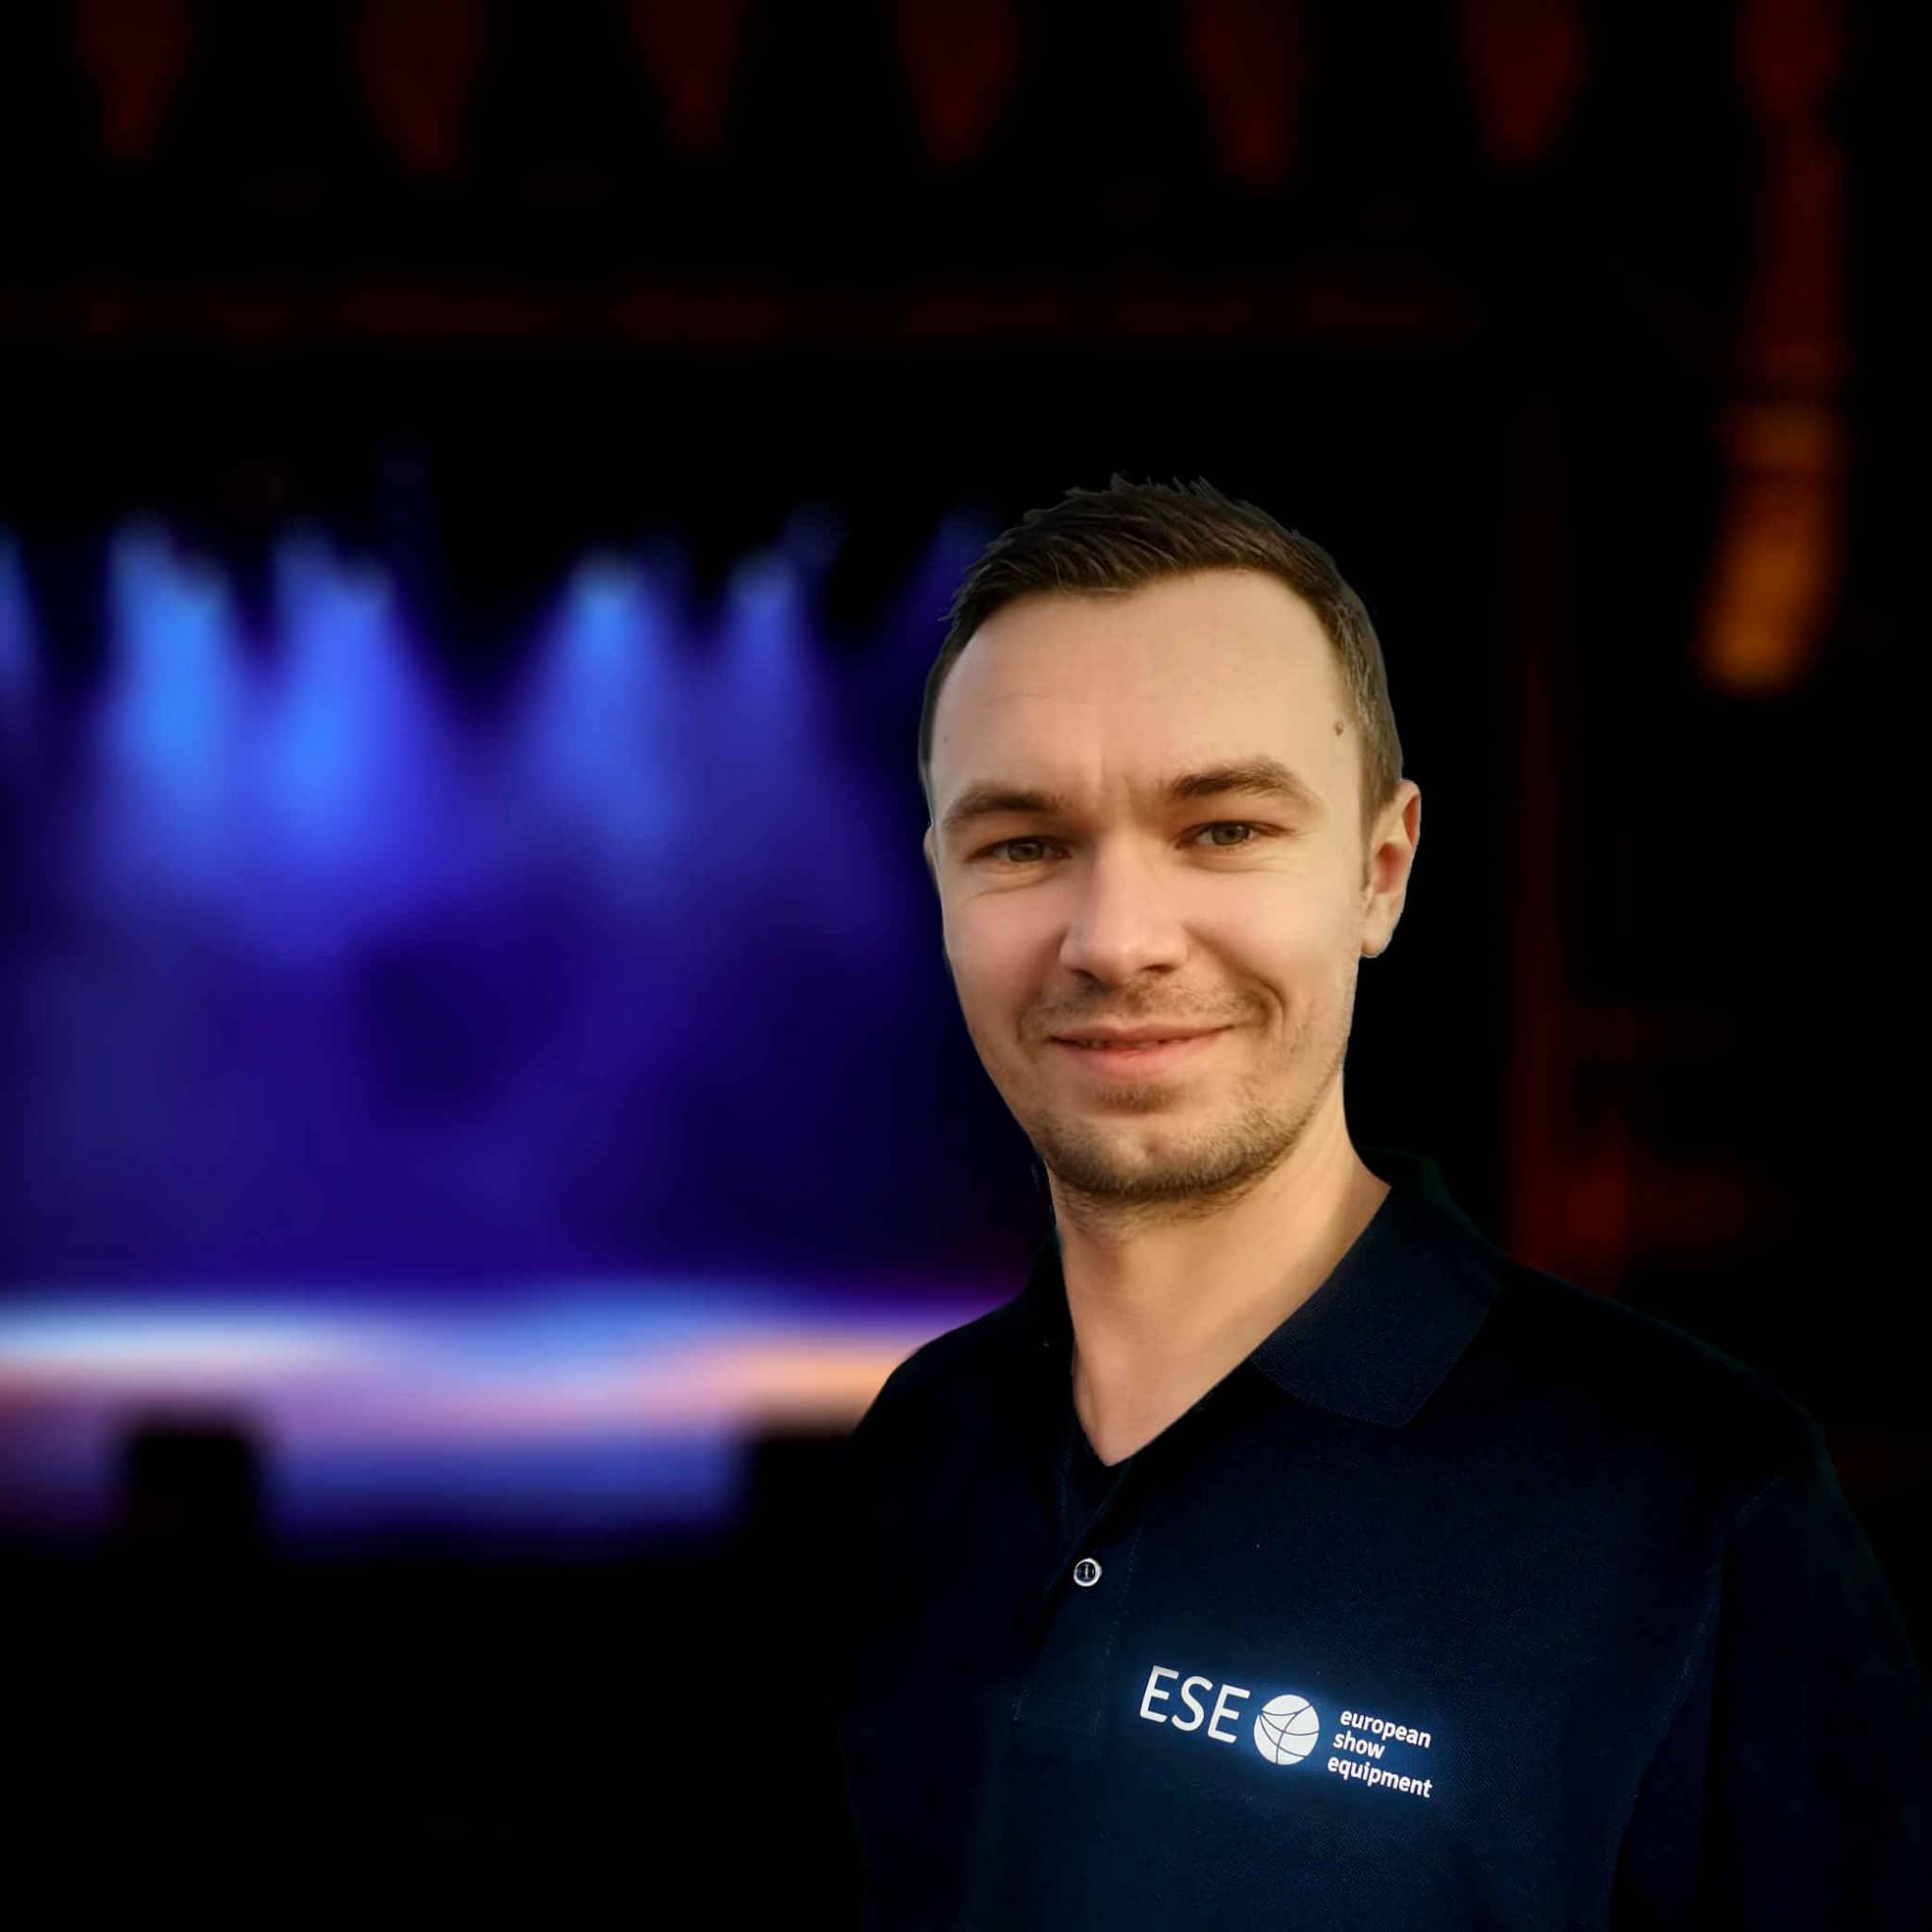 Andreas Schajew COO Leiter des operativen Geschäfts